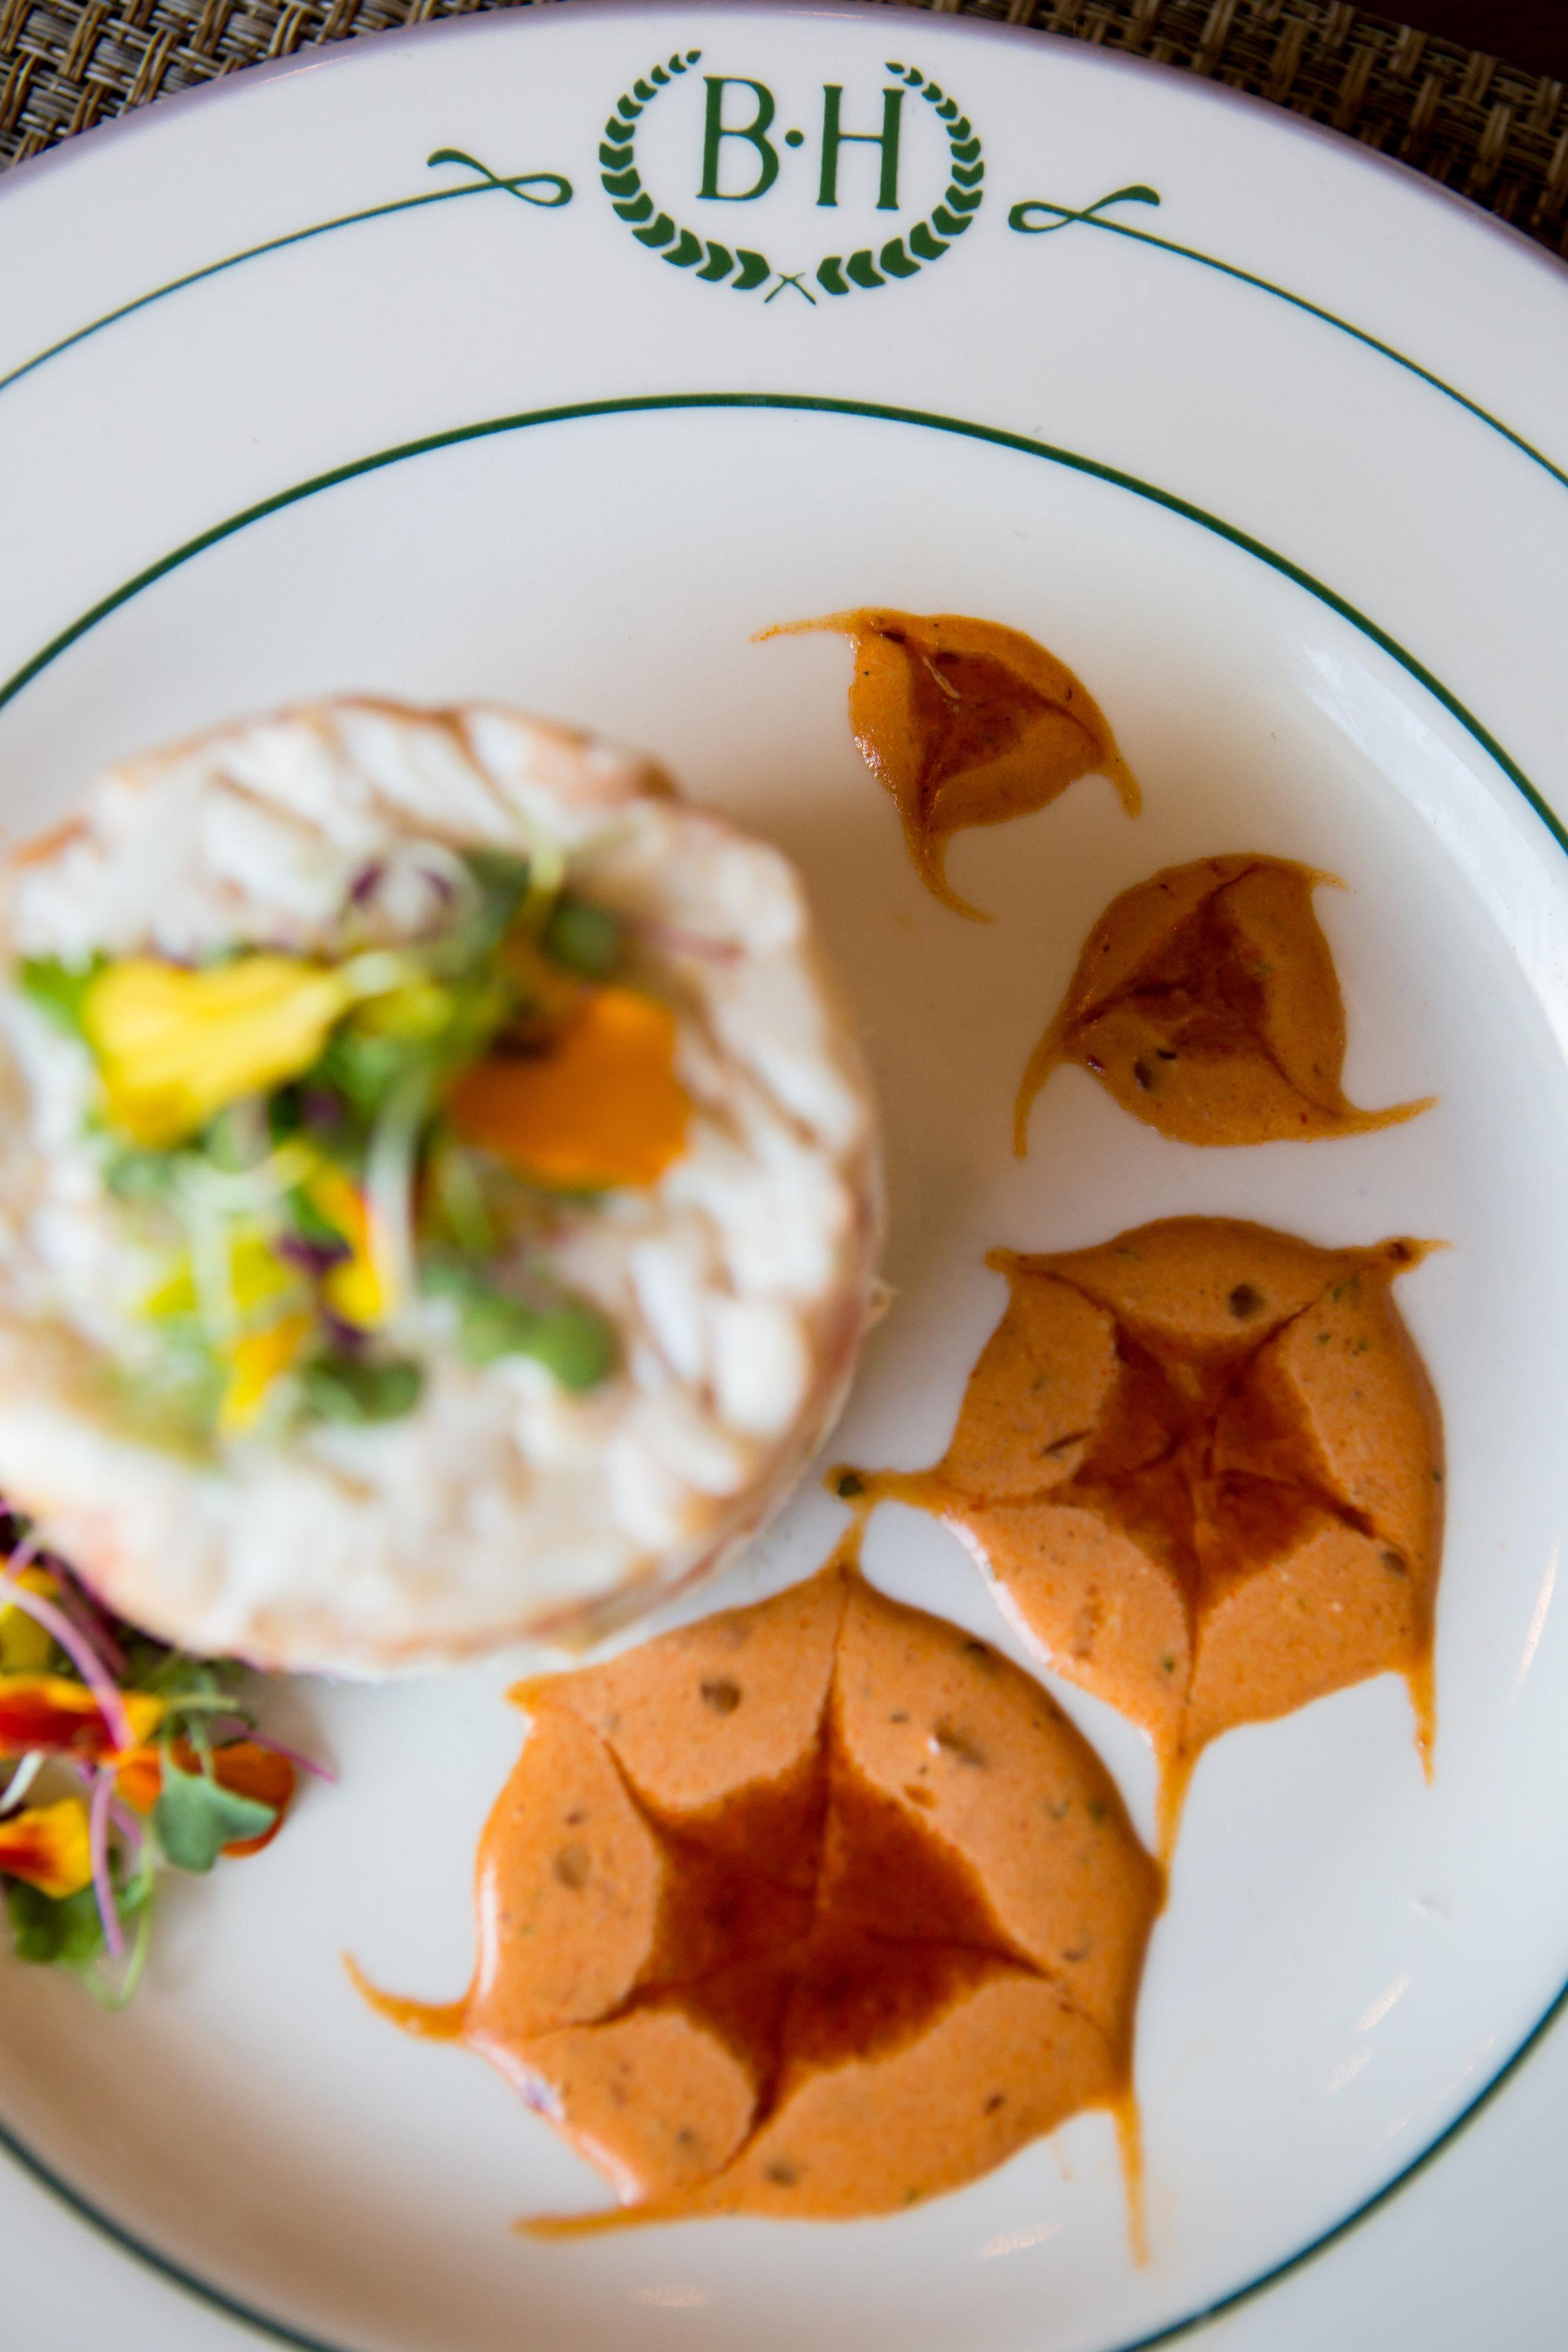 food-photography-chef-portrait-golf-dynamite-studio-food-Plates.jpg